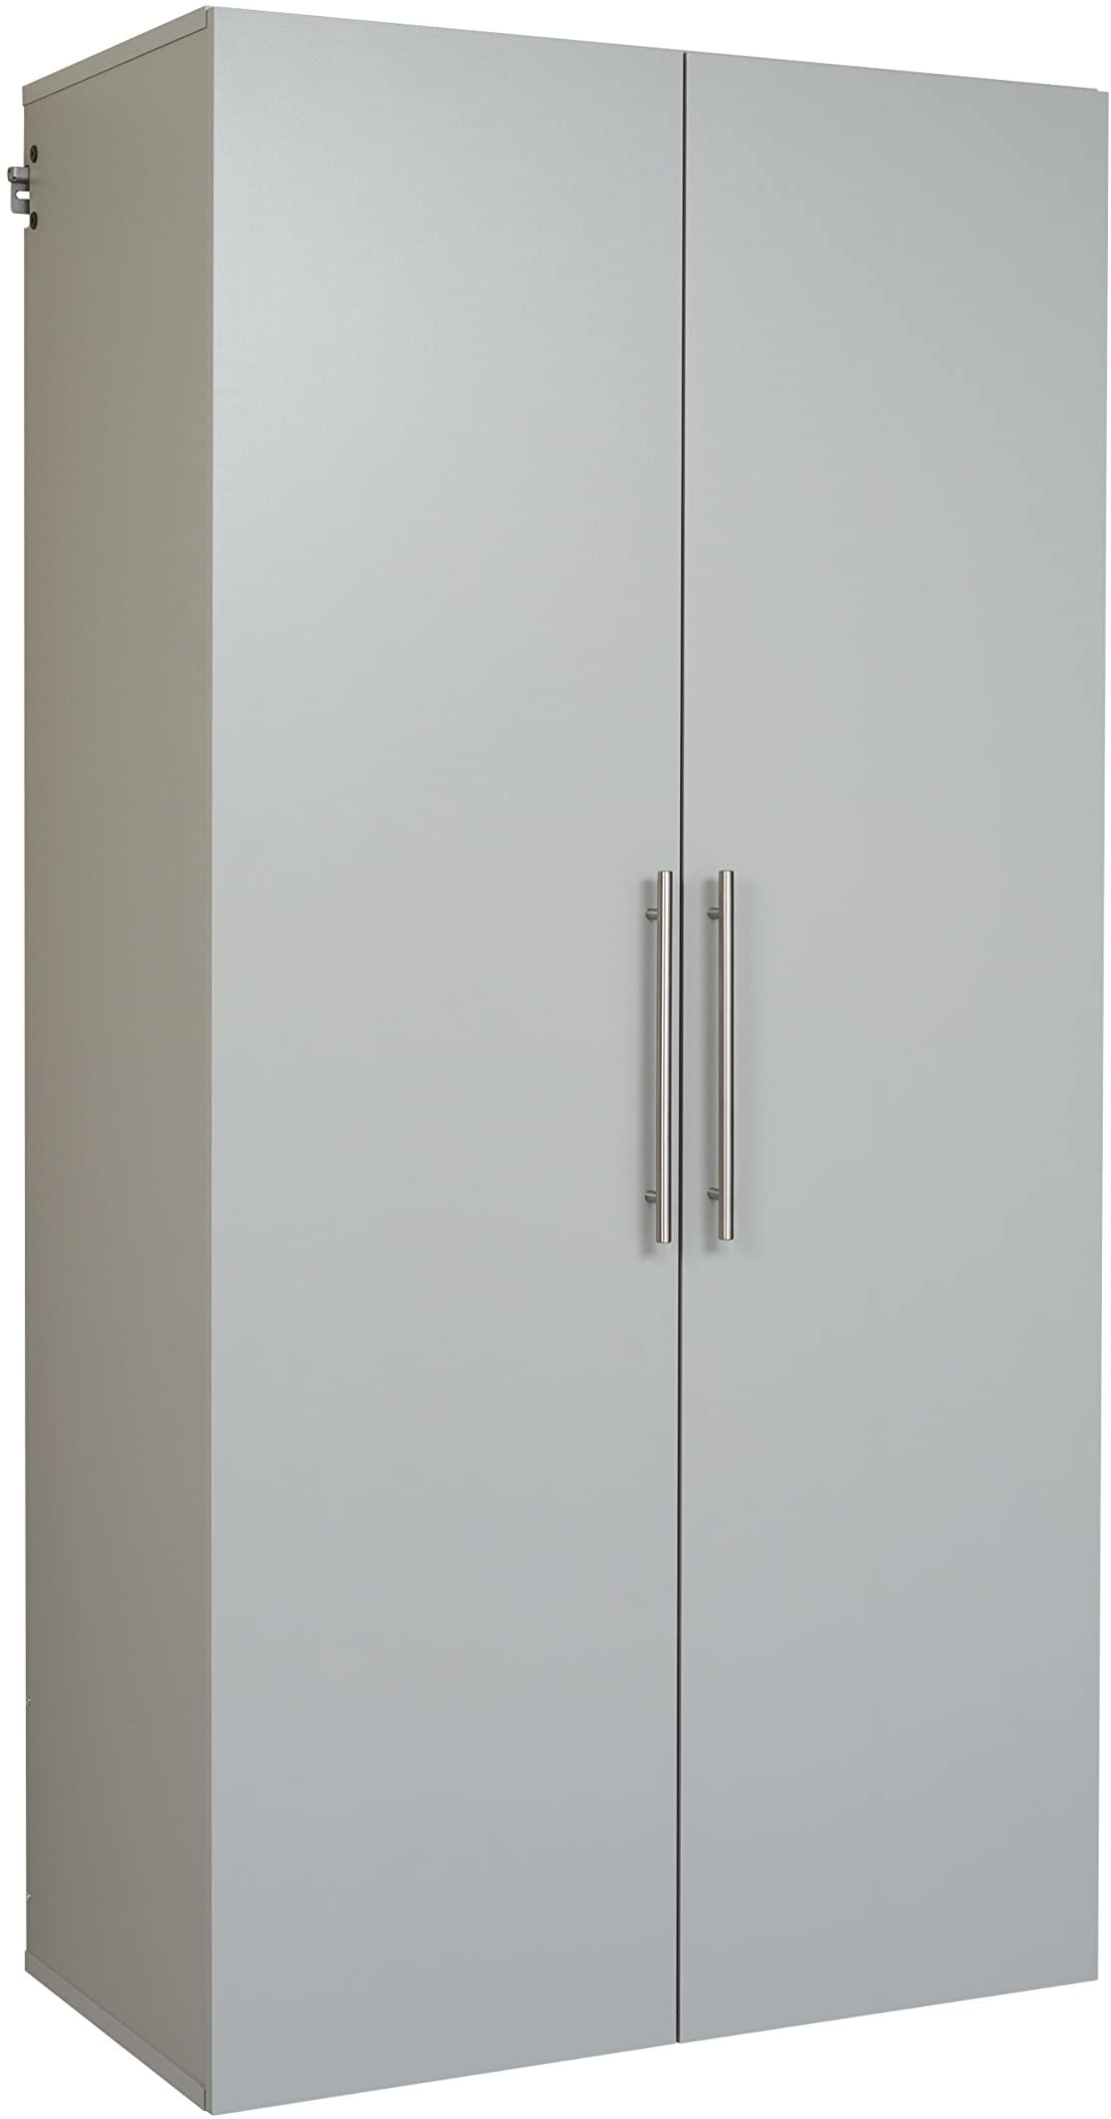 "Prepac Hang-Ups Storage Cabinet, 36""/Large, Light Gray"